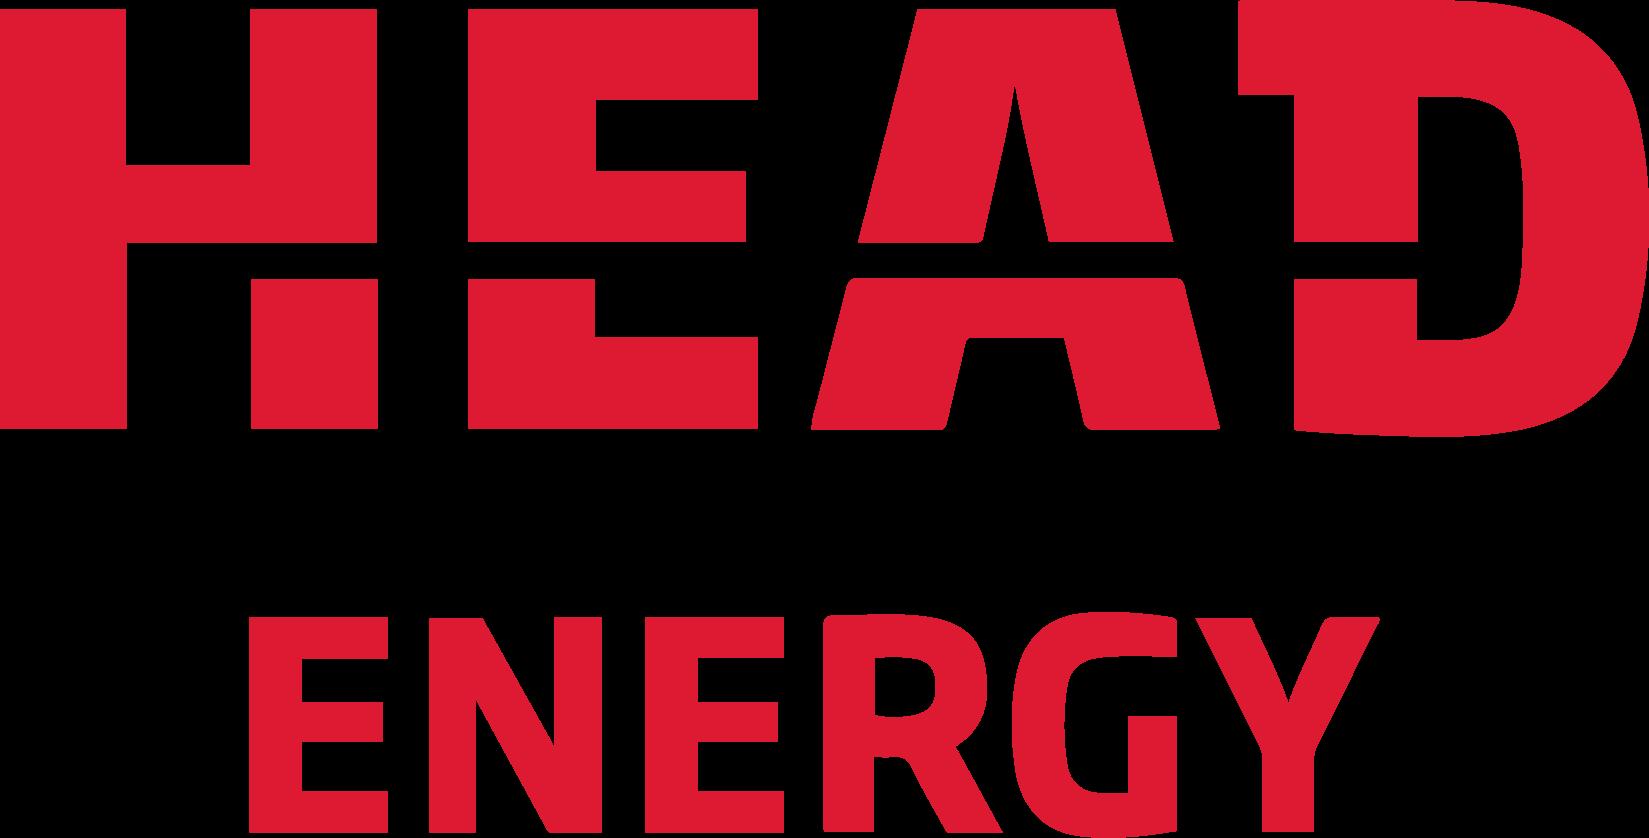 Head Energy logo uten ramme.png